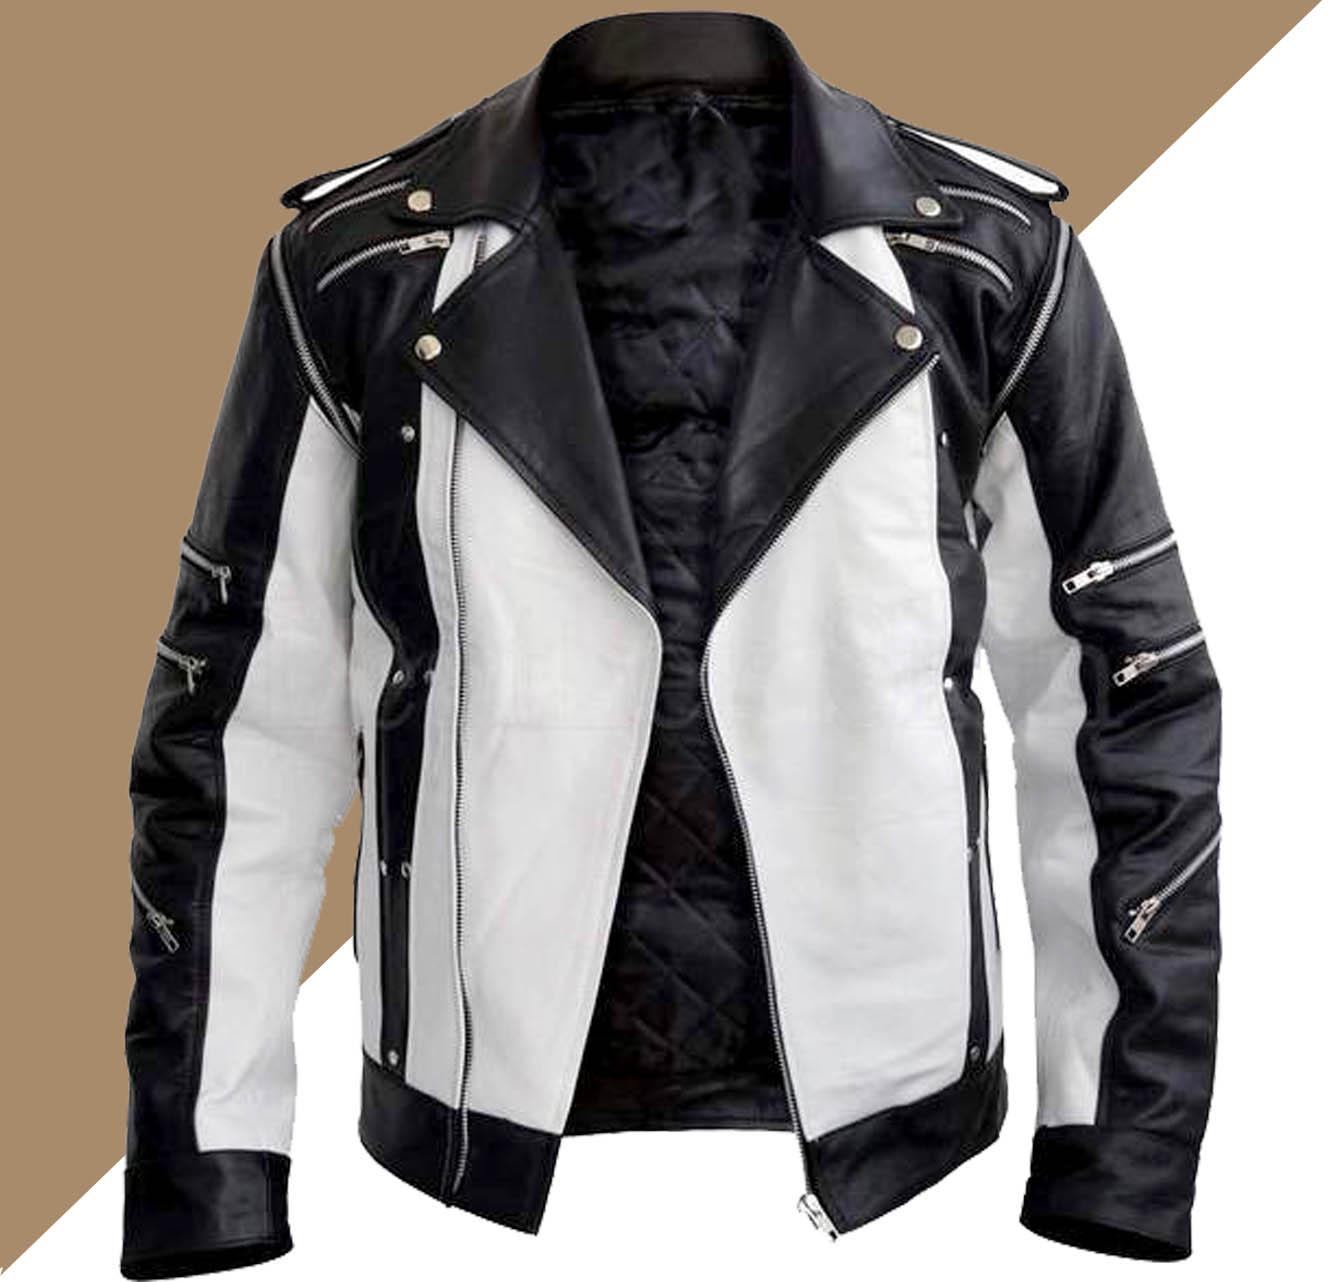 Belanja Jaket Kulit Asli Pria DI Yogyakarta Toko Online Produk Kulit 9d9623ee9a